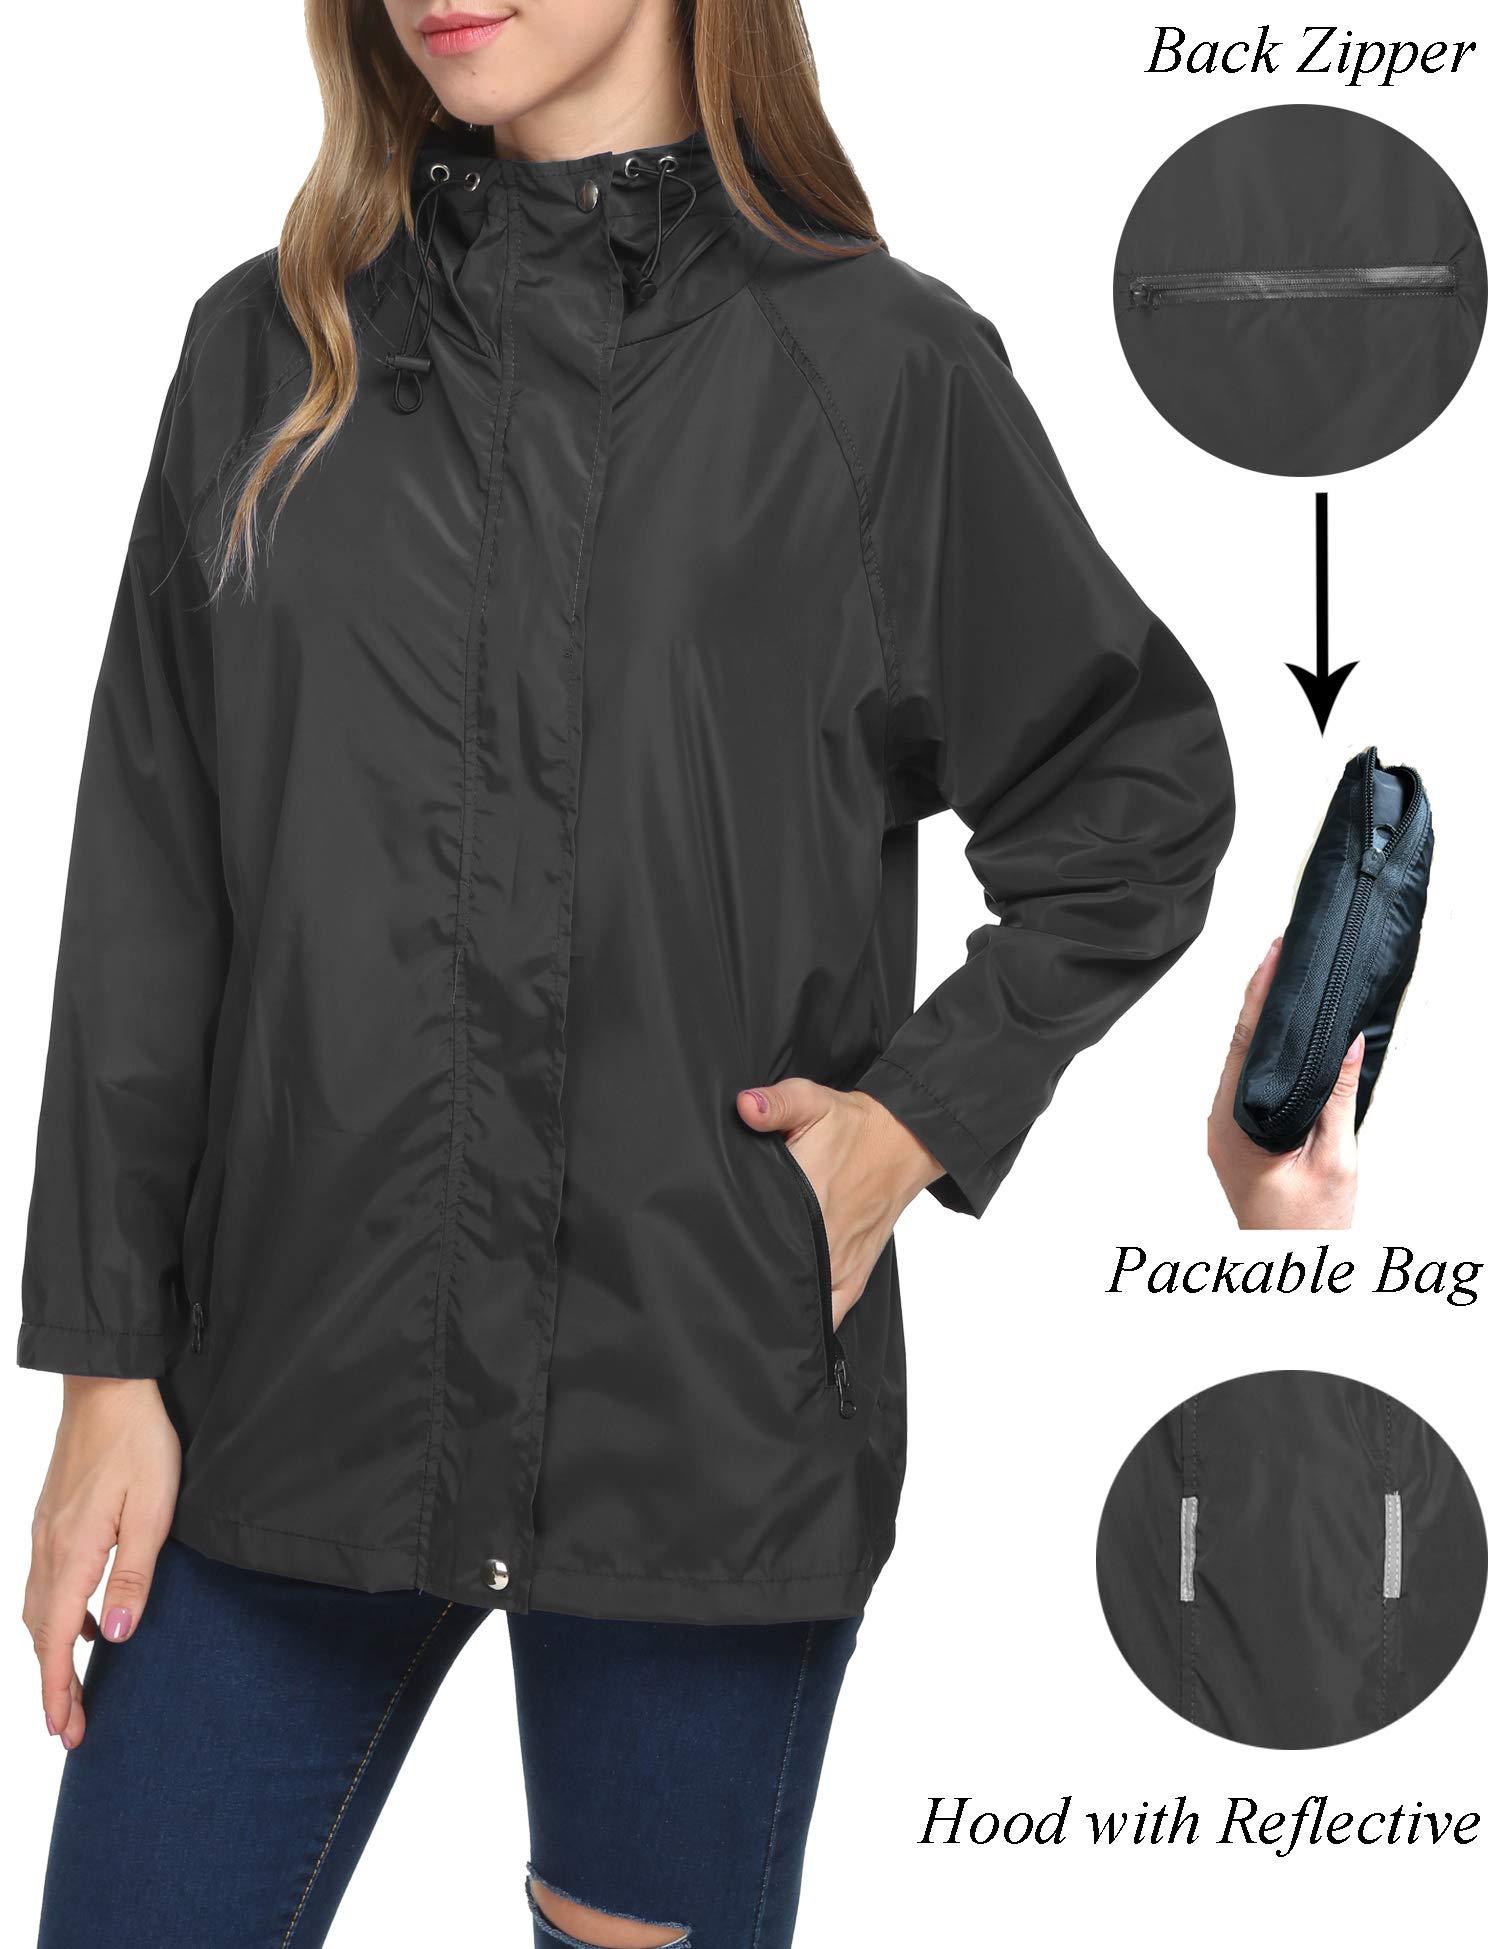 LOMON Raincoat Women Fashion Solid Rainproof Softwell Rain Jacket Outerwear(Black,XL)